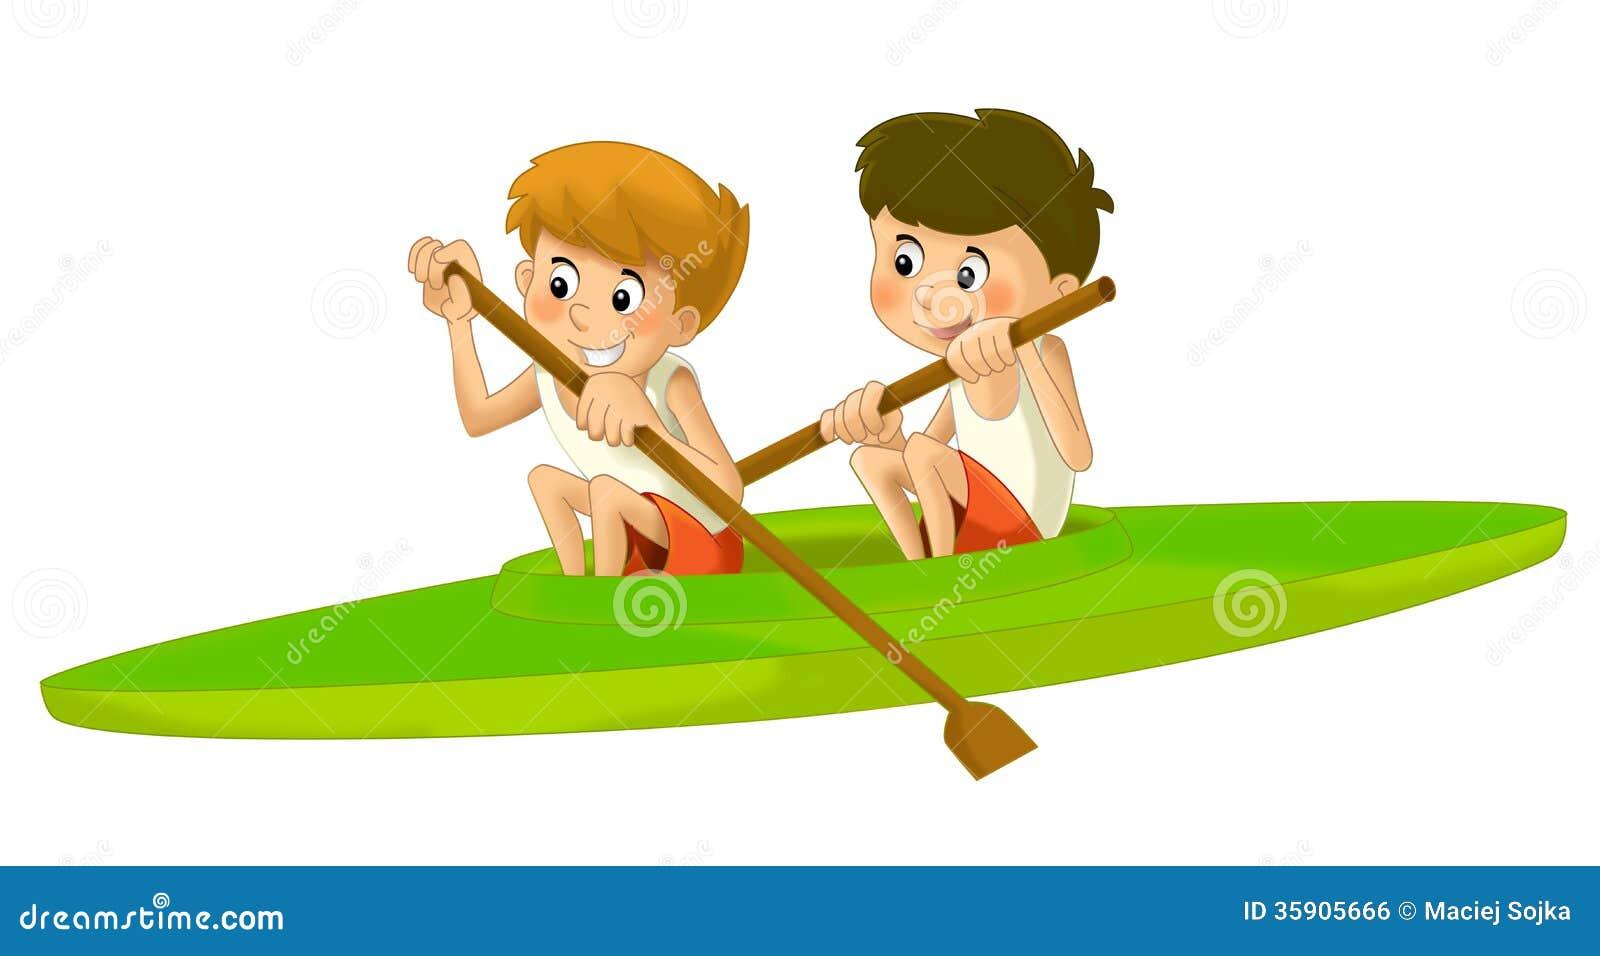 Cartoon Child Training Illustration For The Children